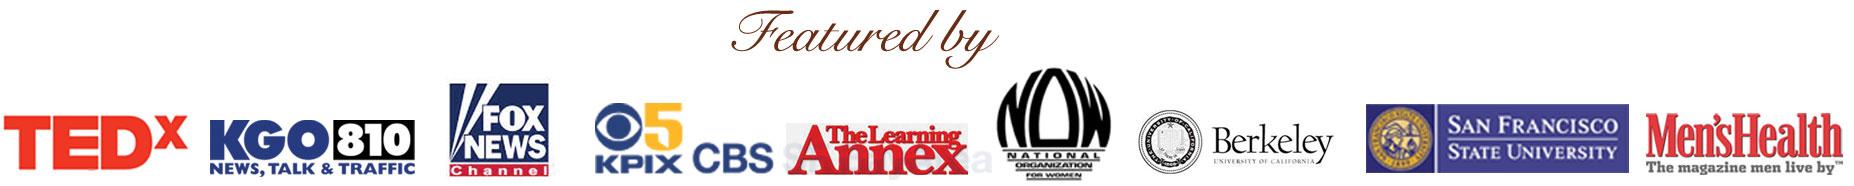 logos-where-I've-been-featured.jpg